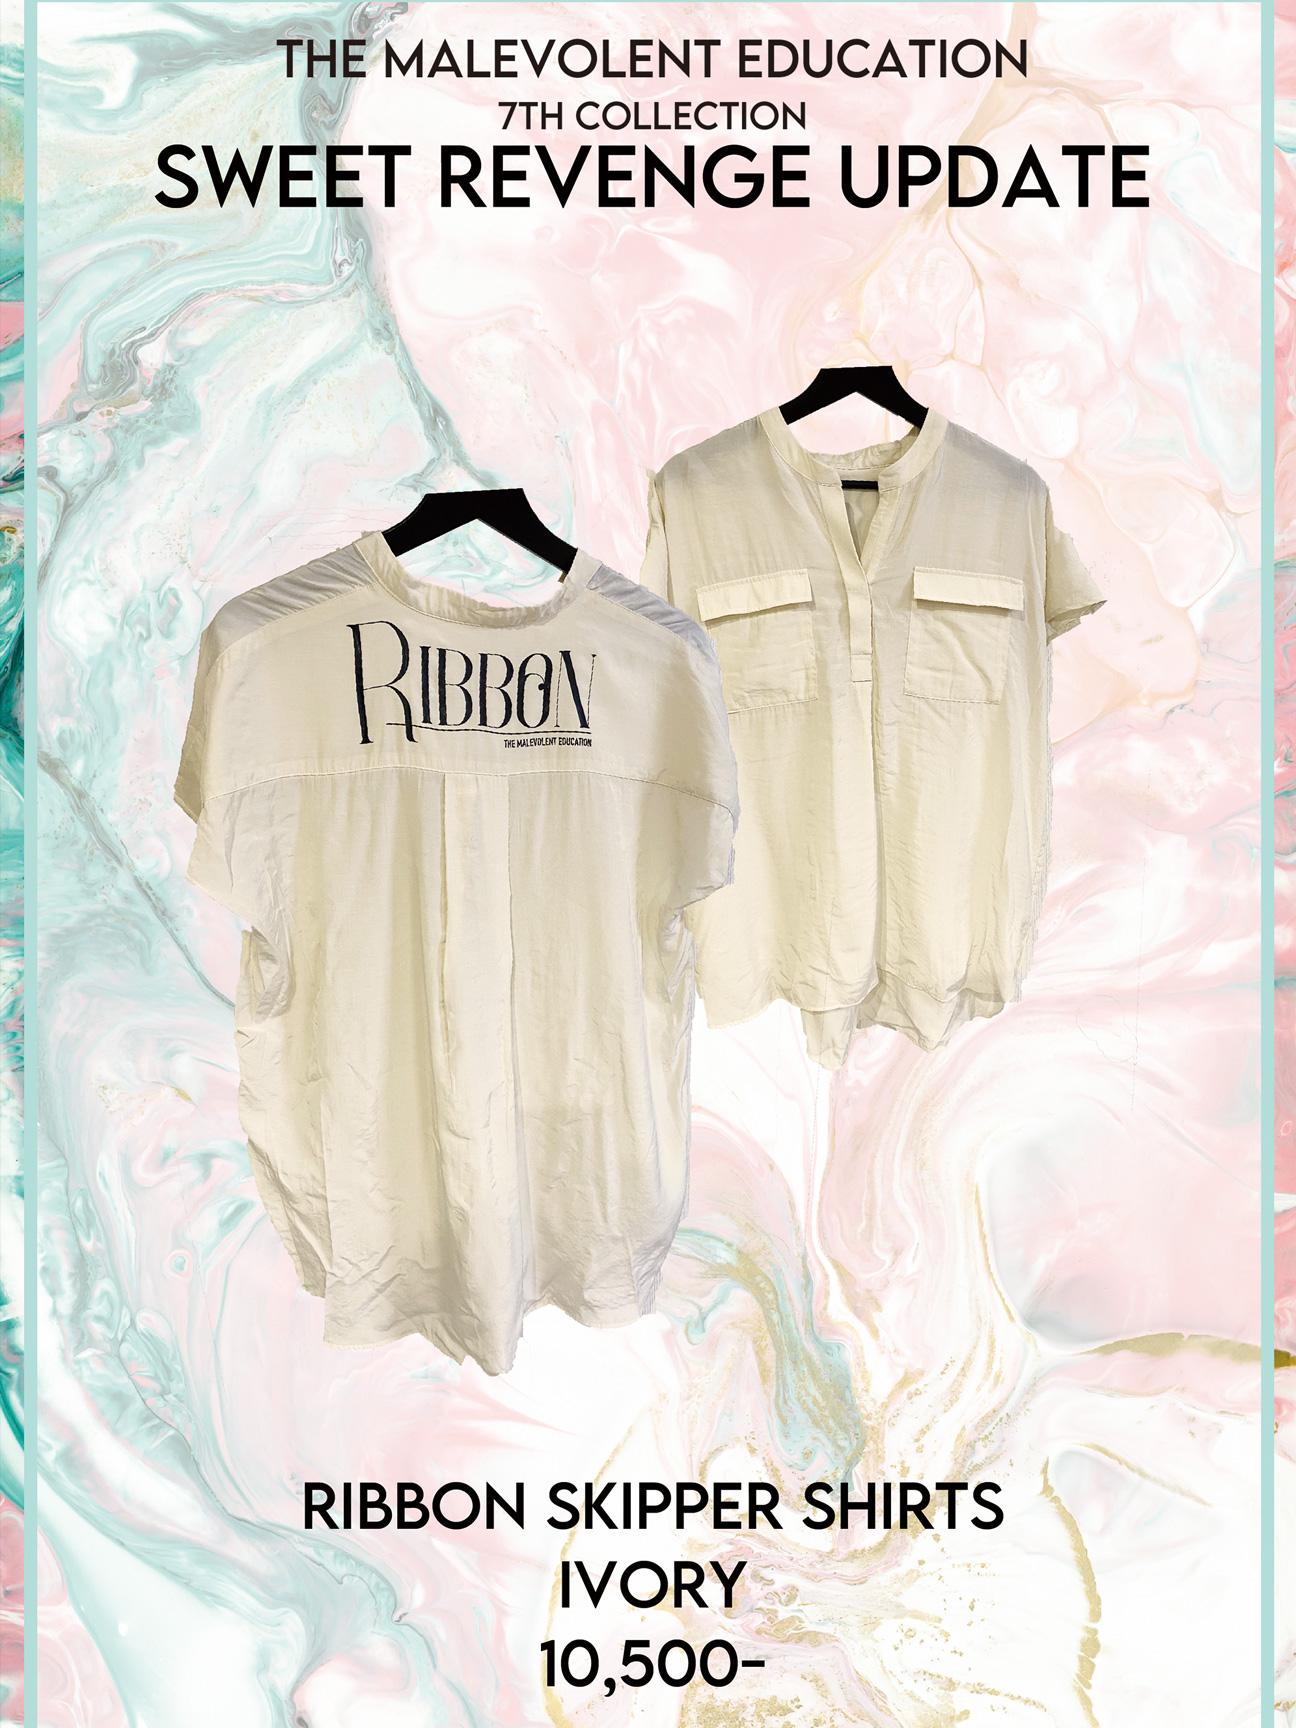 RIBBON SKIPPER SHIRTS IVORY